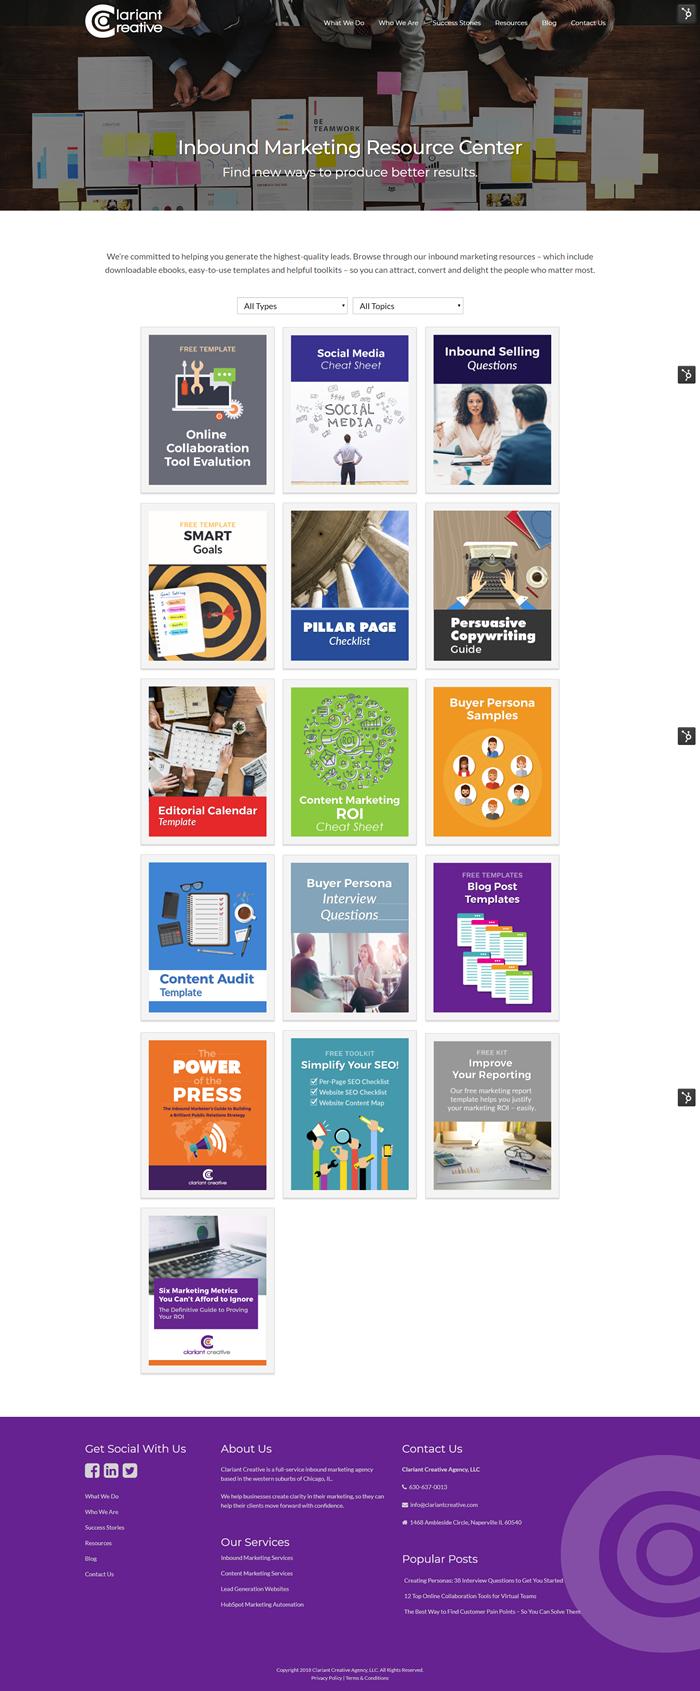 Clariant Creative Resources